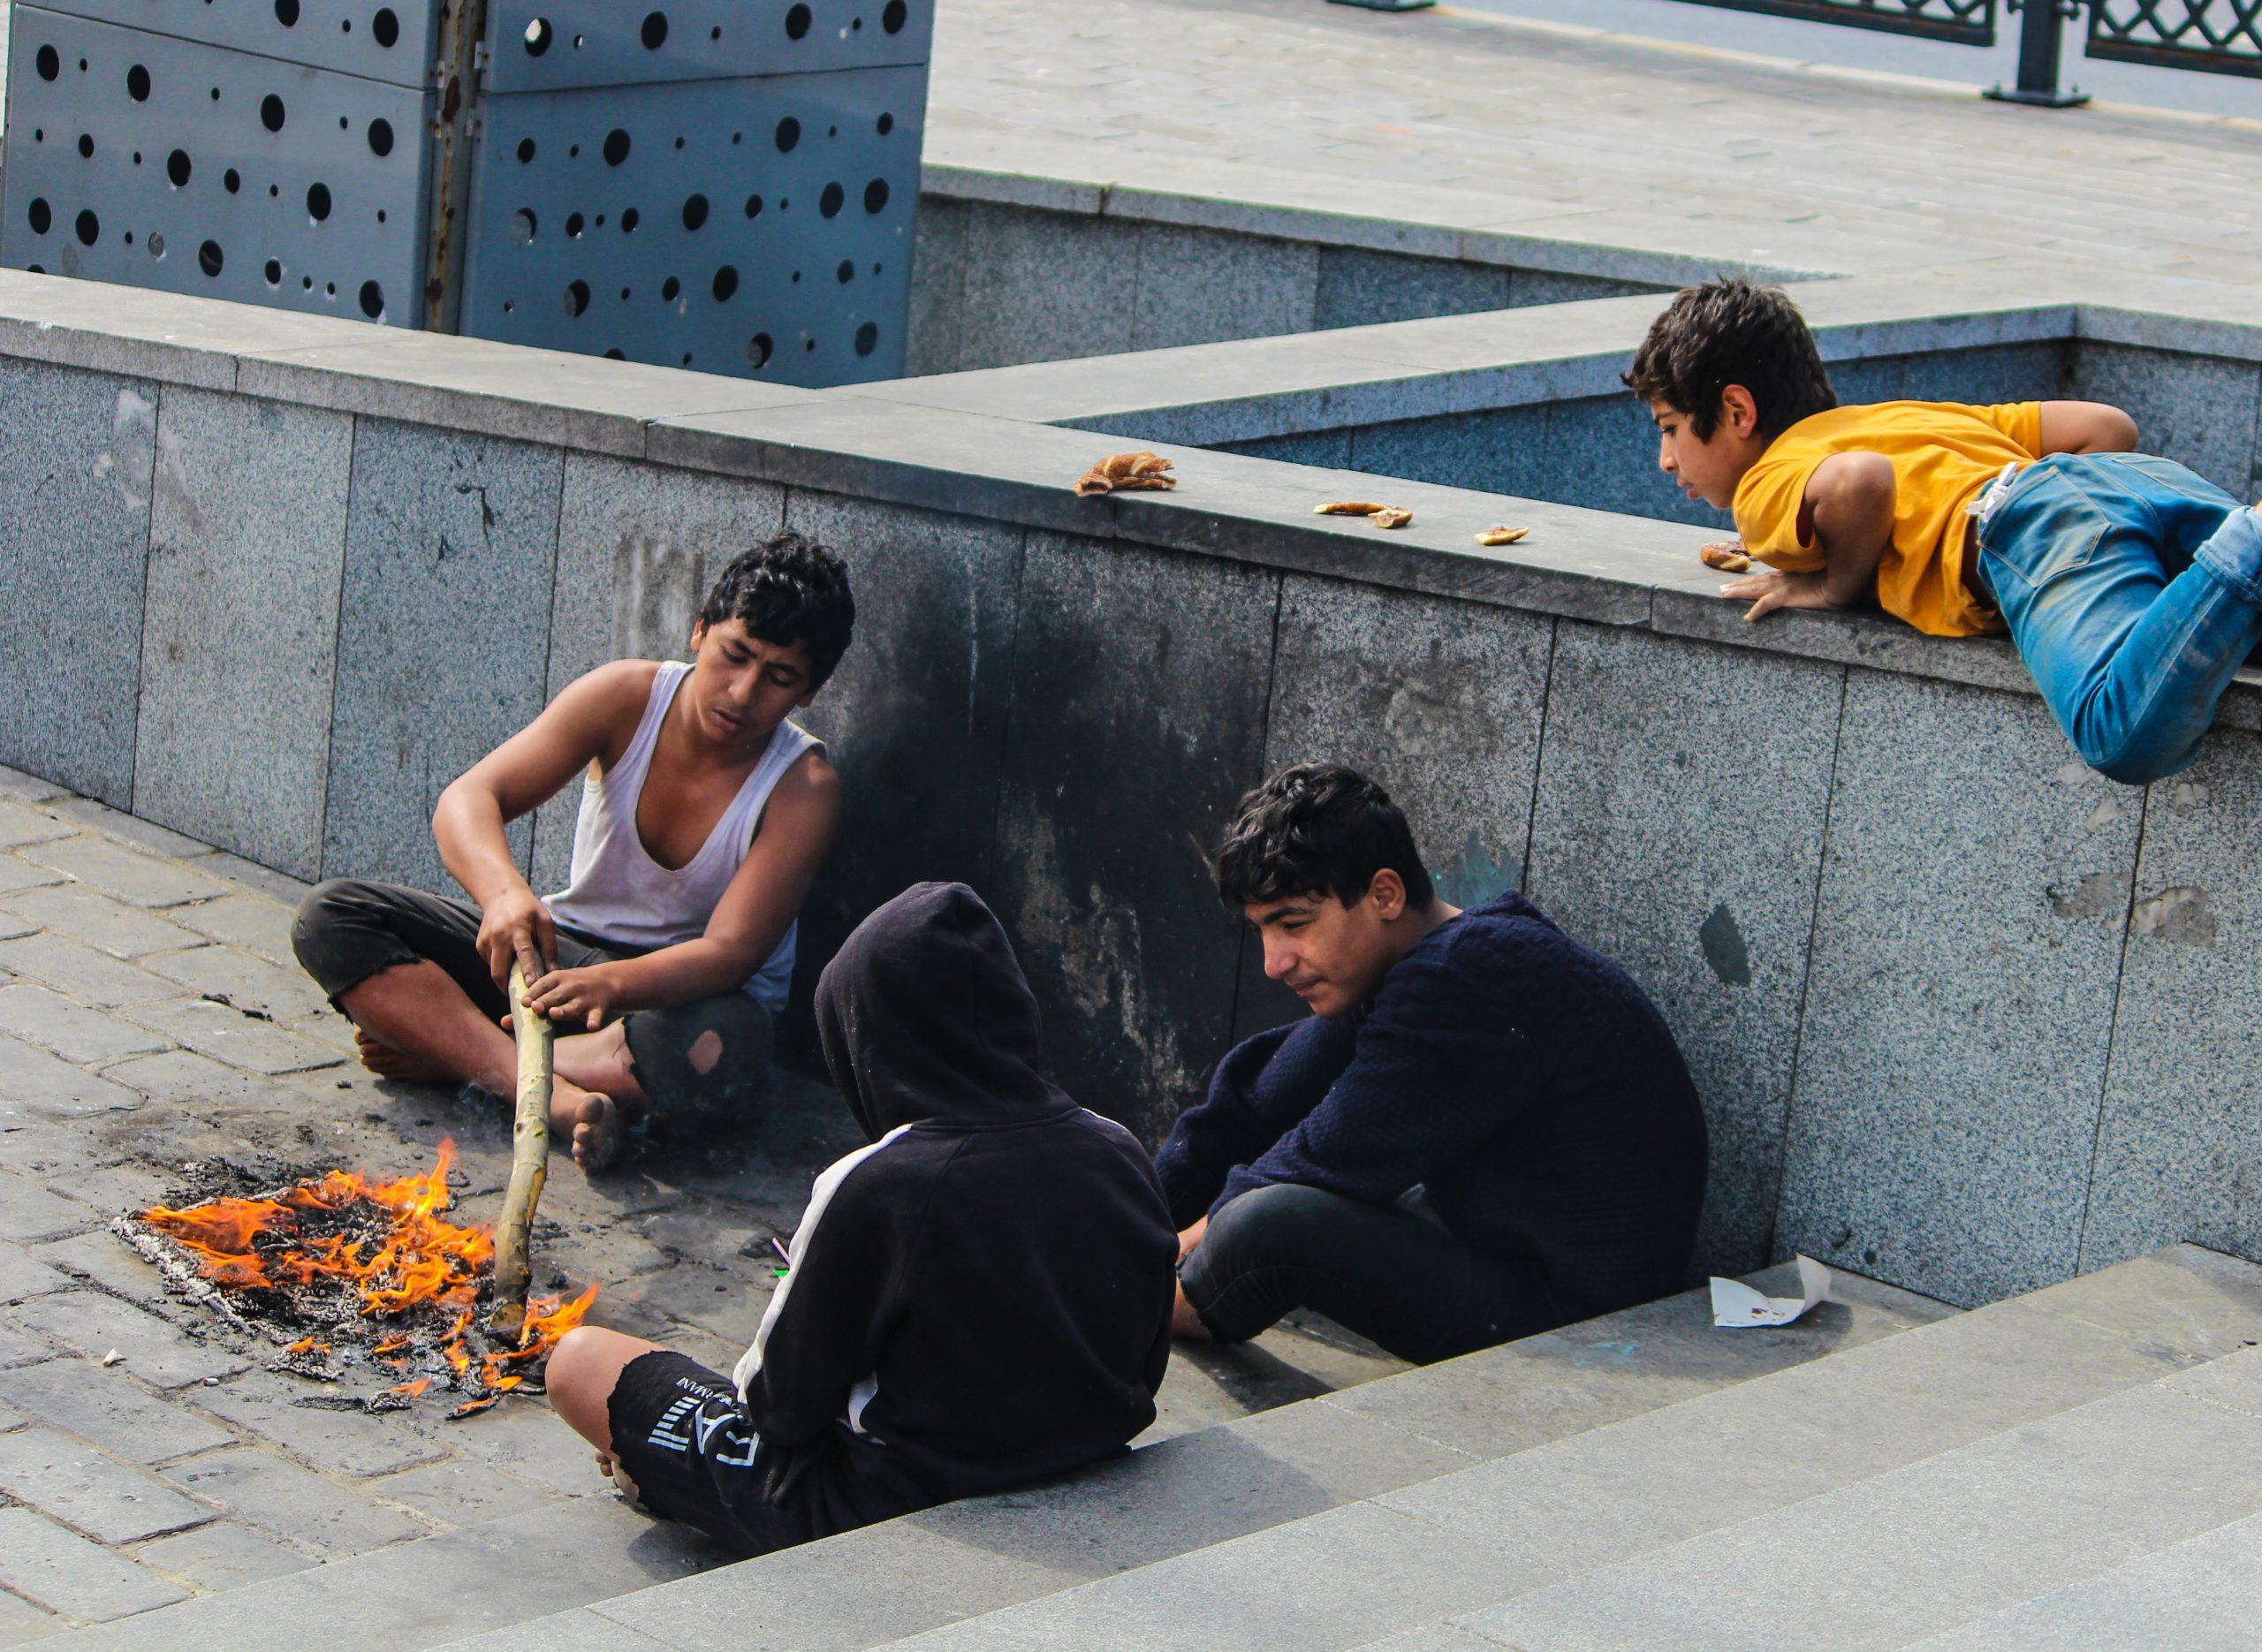 Street children burning fire